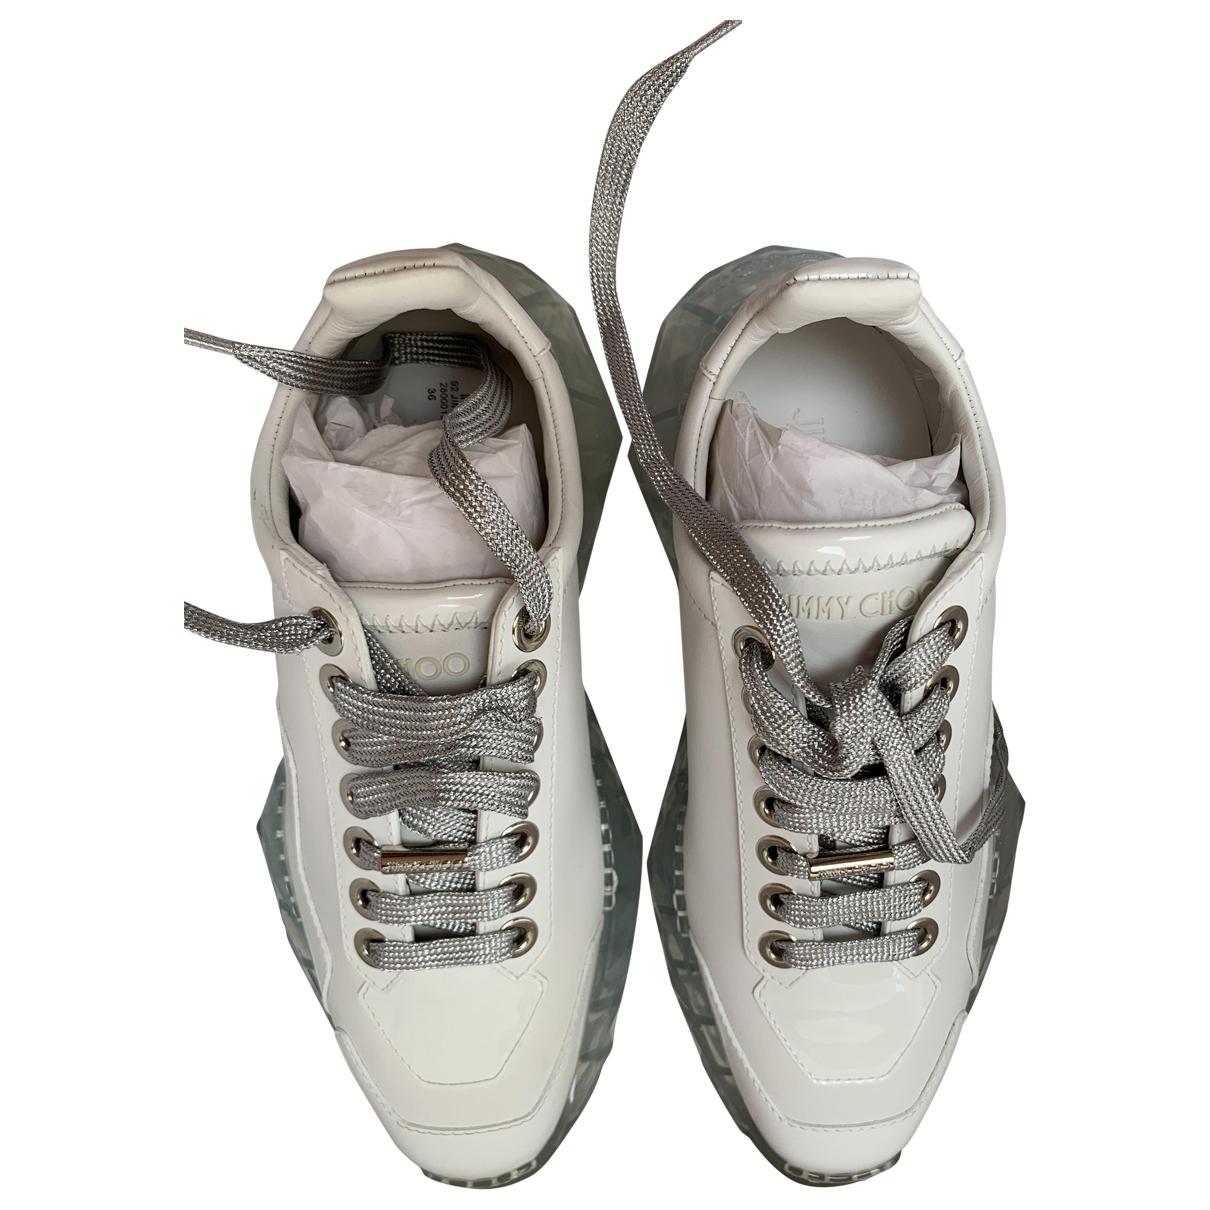 Jimmy Choo Diamond Sneakers in  Weiss Lackleder